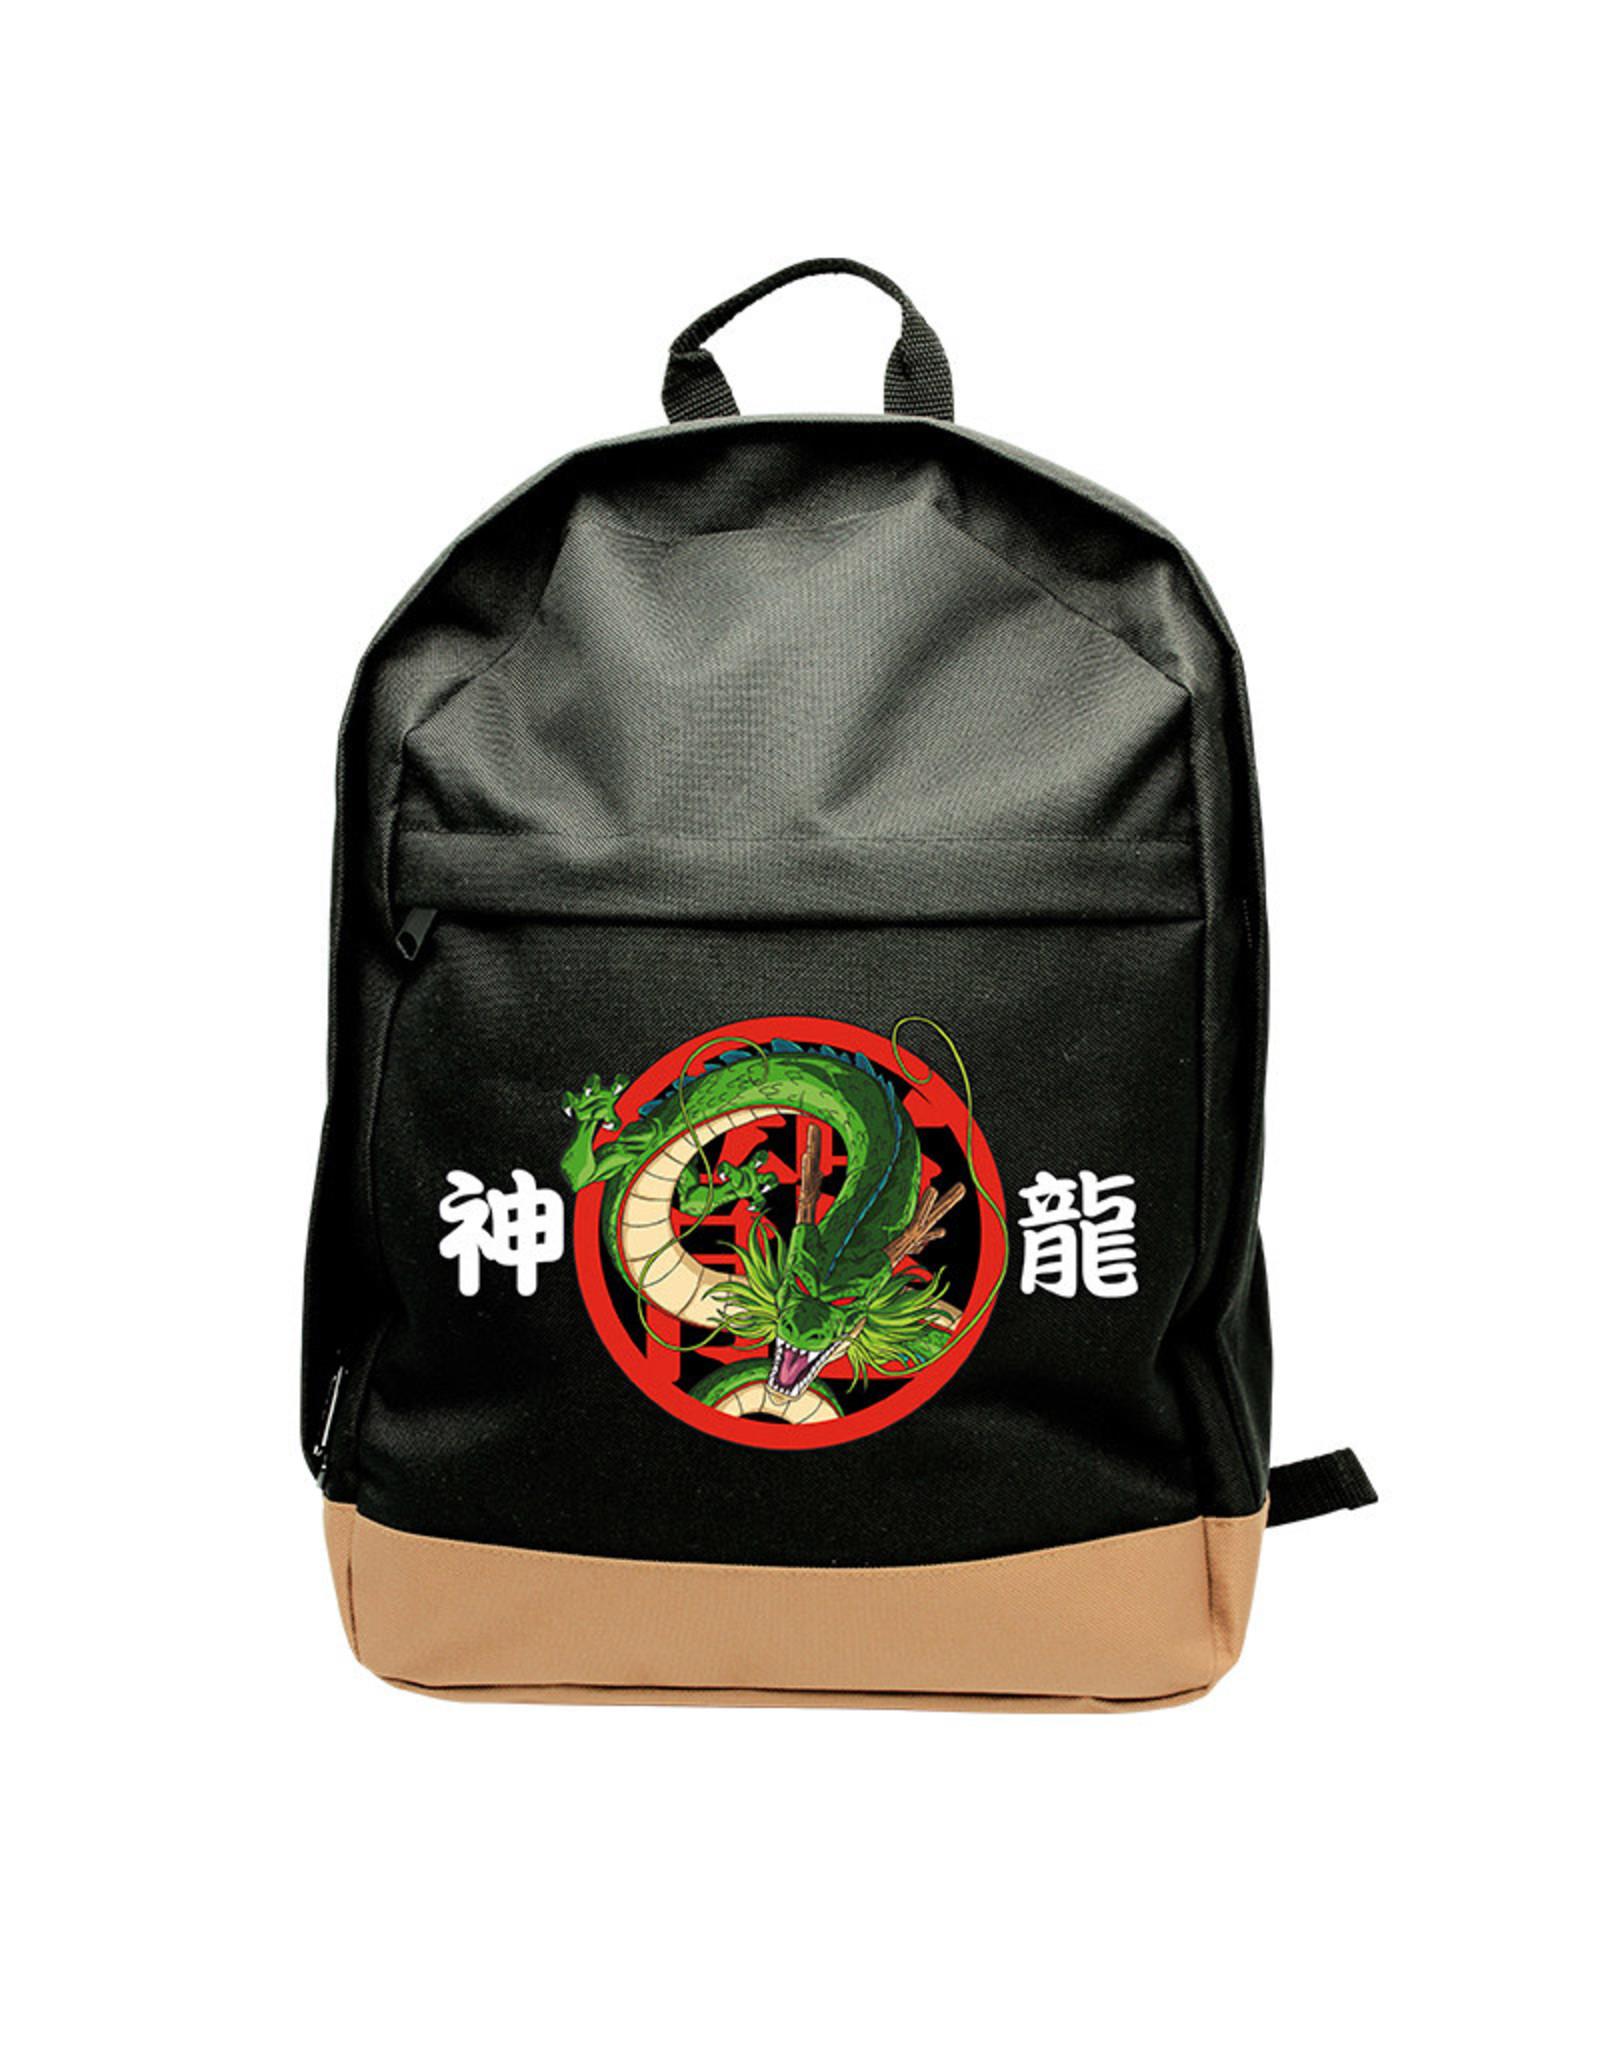 DRAGON BALL - Backpack - Shenron